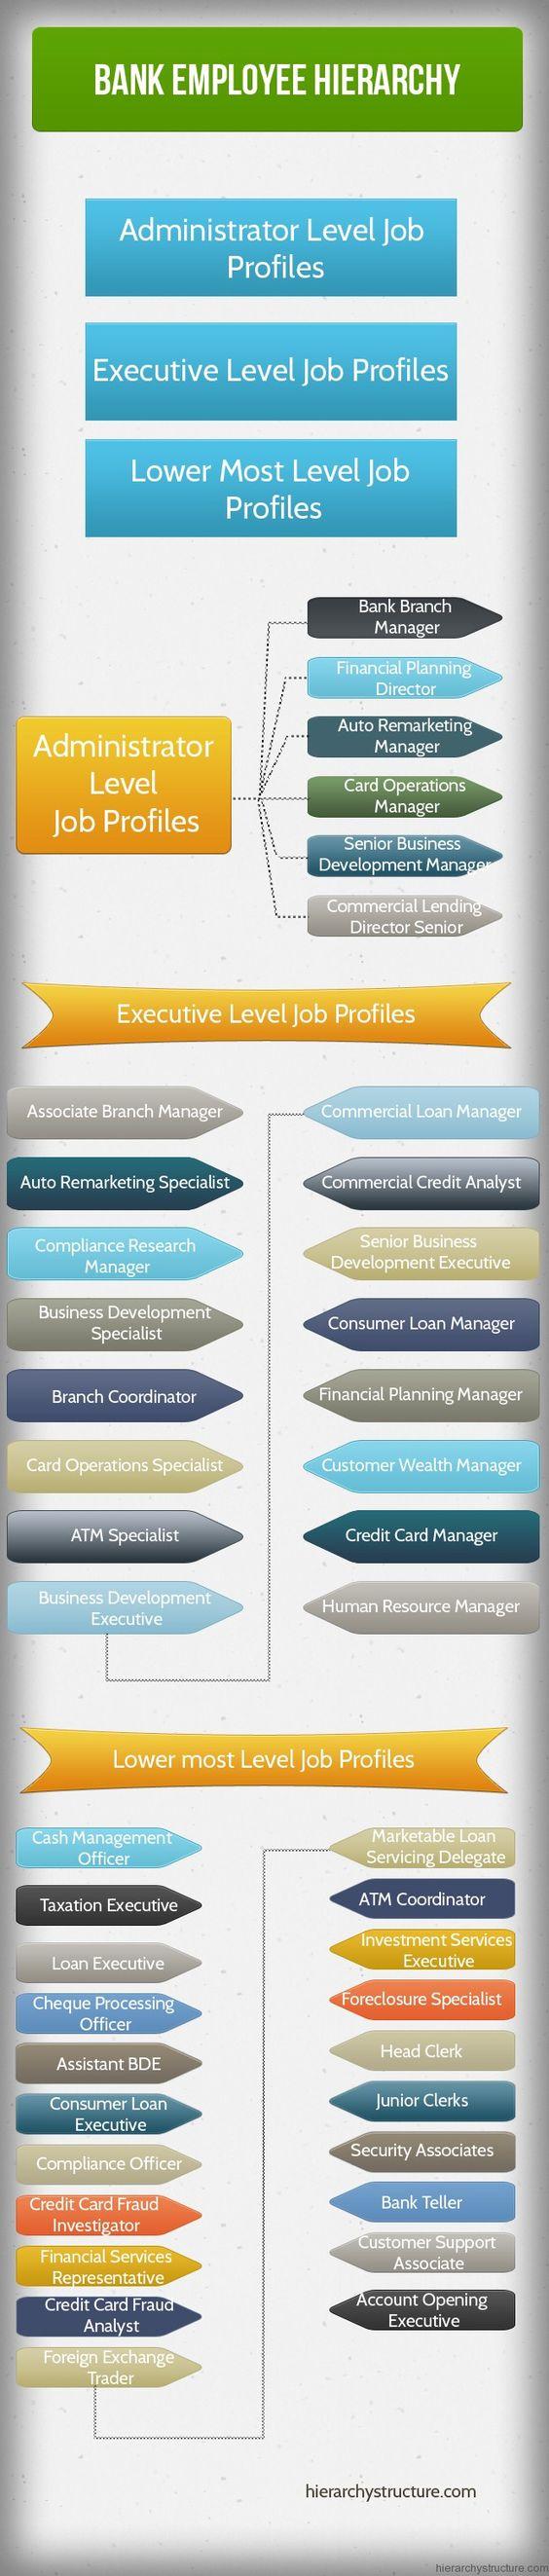 Bank Employee Hierarchy Jobs Hierarchy Pinterest